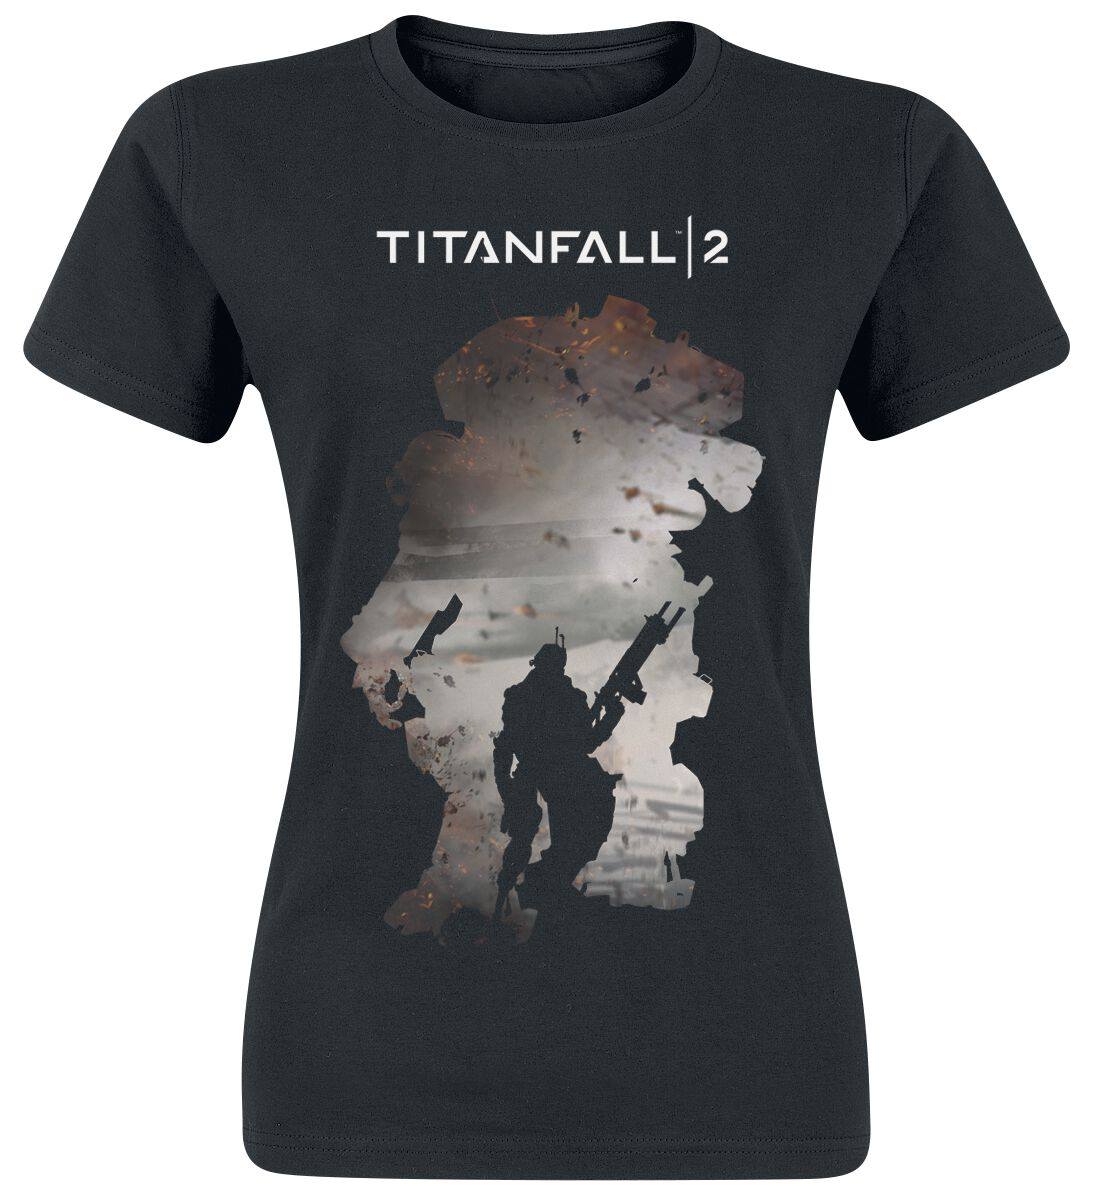 Merch dla Fanów - Koszulki - Koszulka damska Titanfall 2 - Titan Scorch & Regie Koszulka damska czarny - 342147